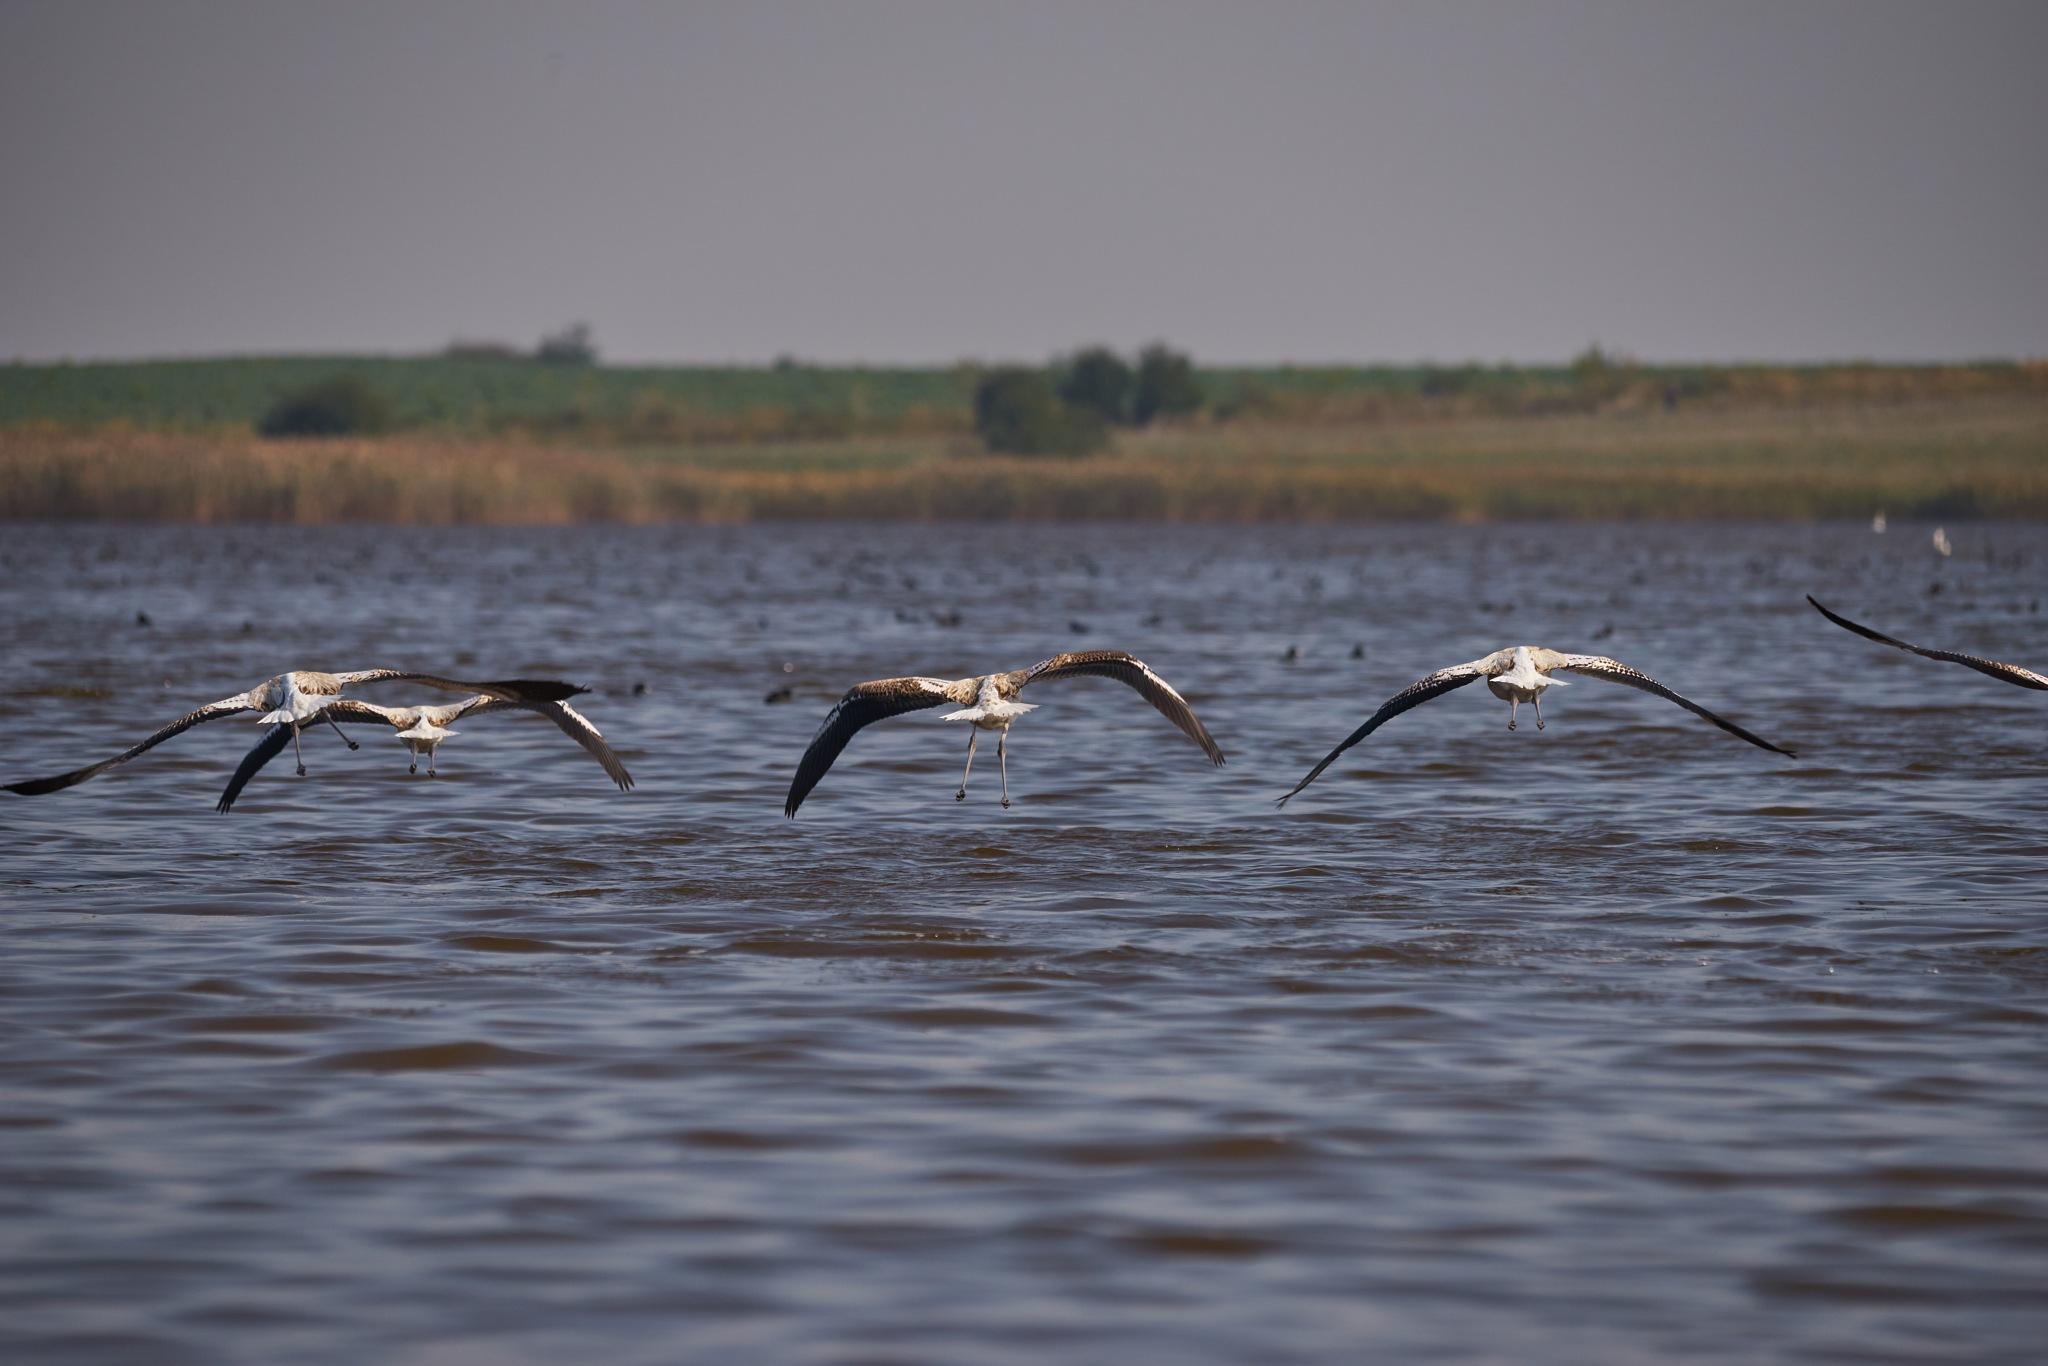 Flamingo by Sorin Gudumac